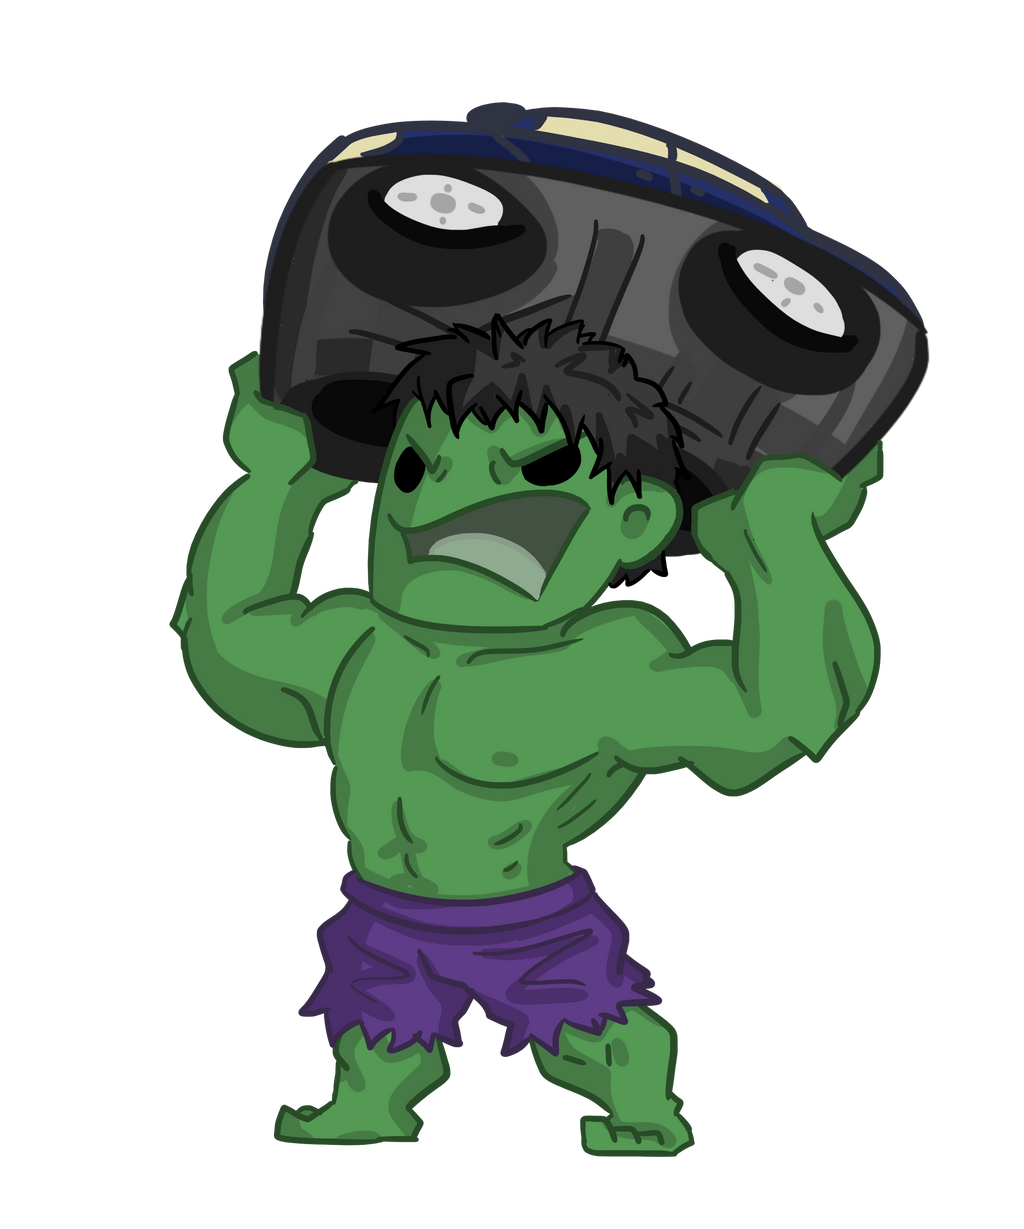 Chibi Hulk Cute Chibis The Hulk Bruce